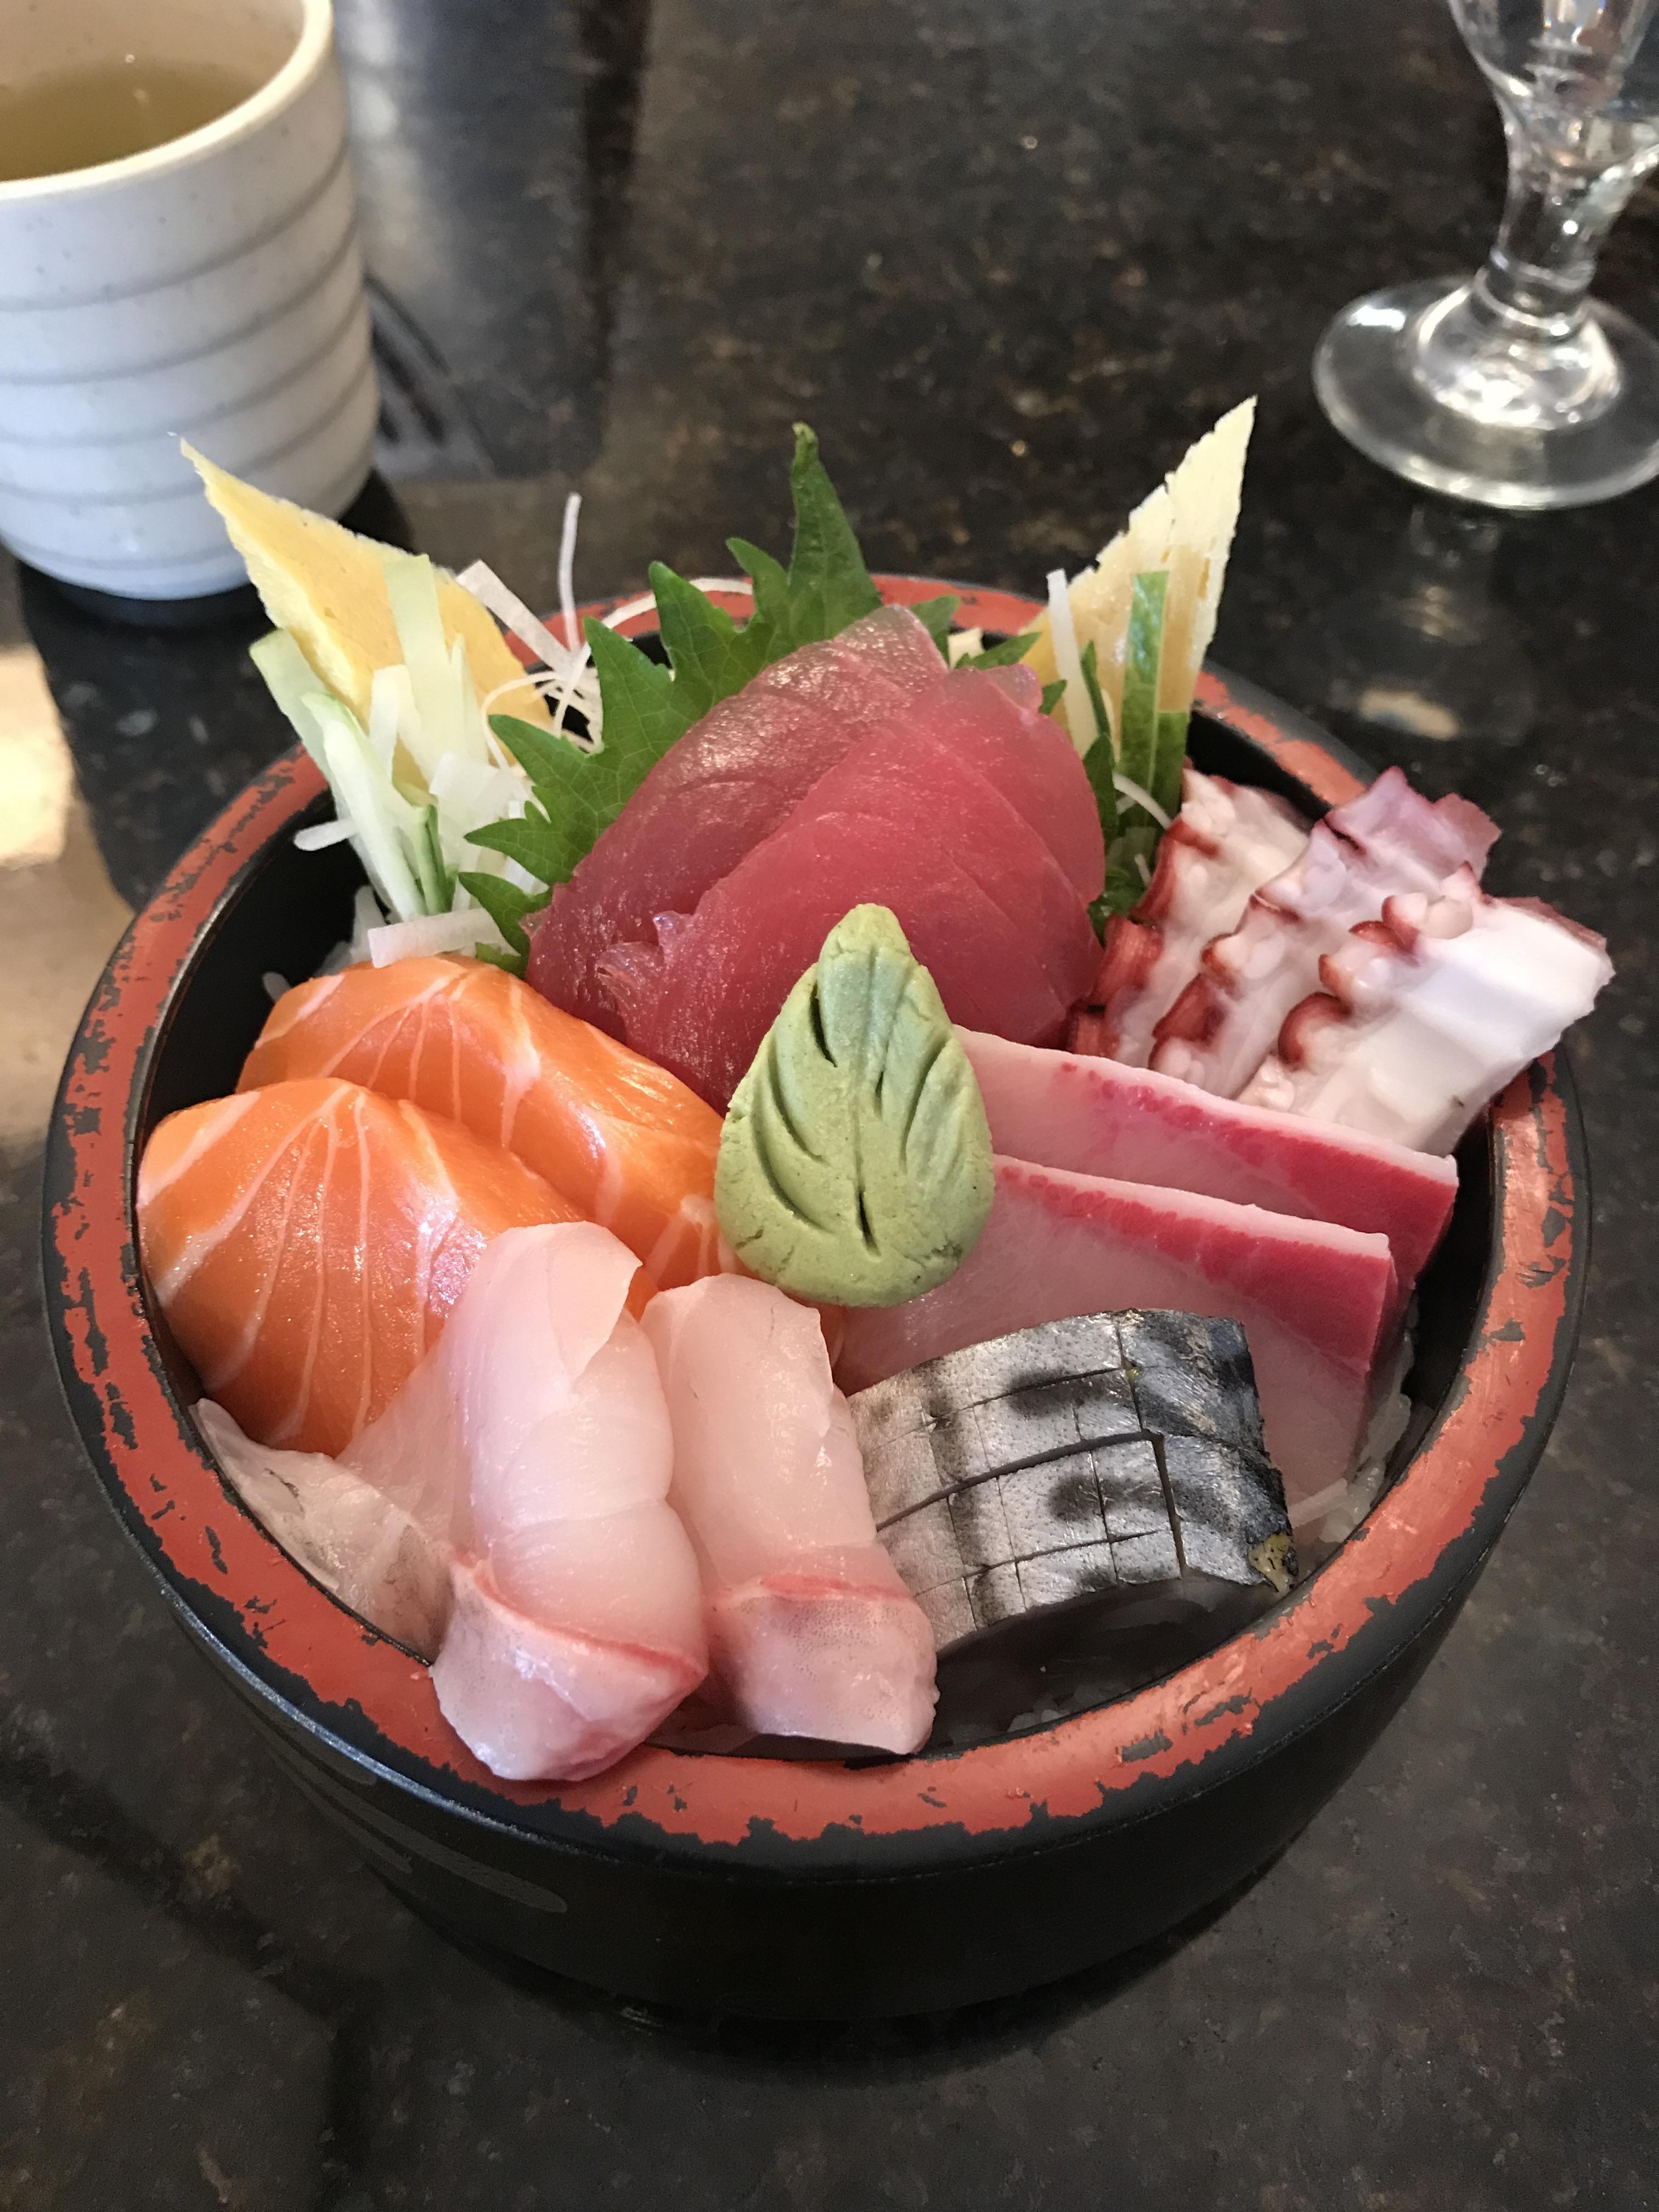 Chirashi From Ebi Sushi In Somerville Ma Sushi Food Foodporn